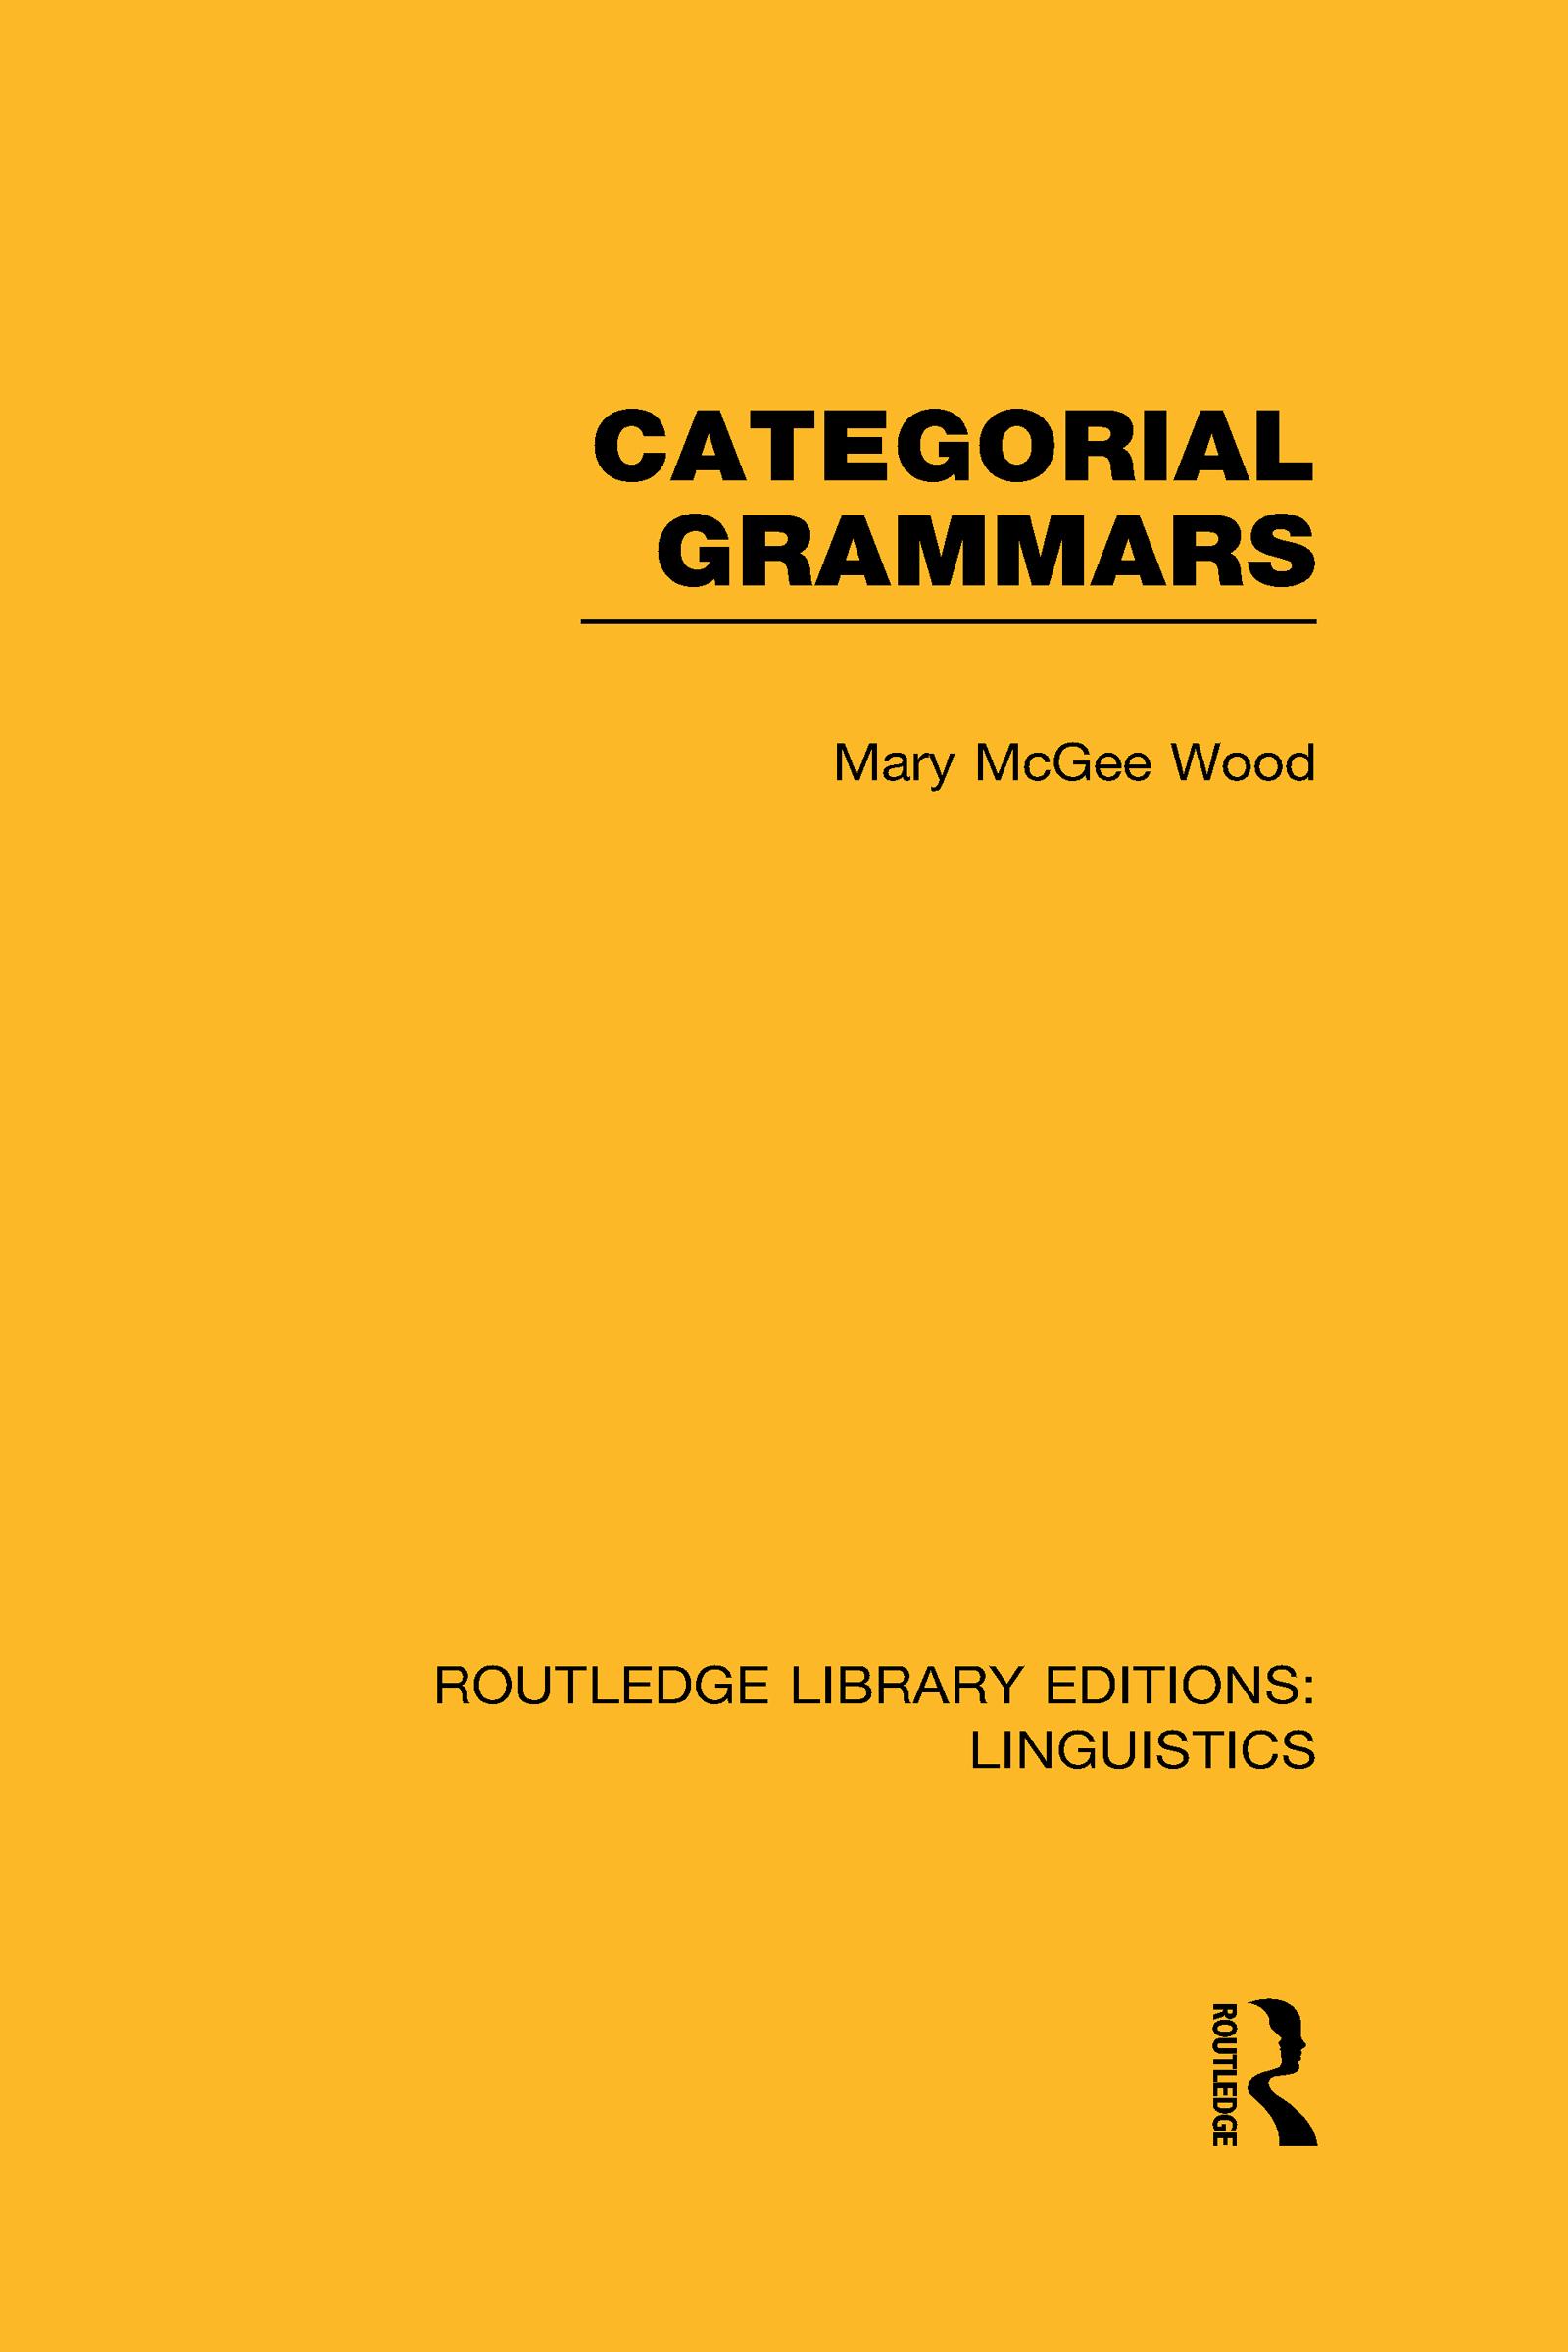 Categorial Grammars (RLE Linguistics B: Grammar) (Hardback) book cover